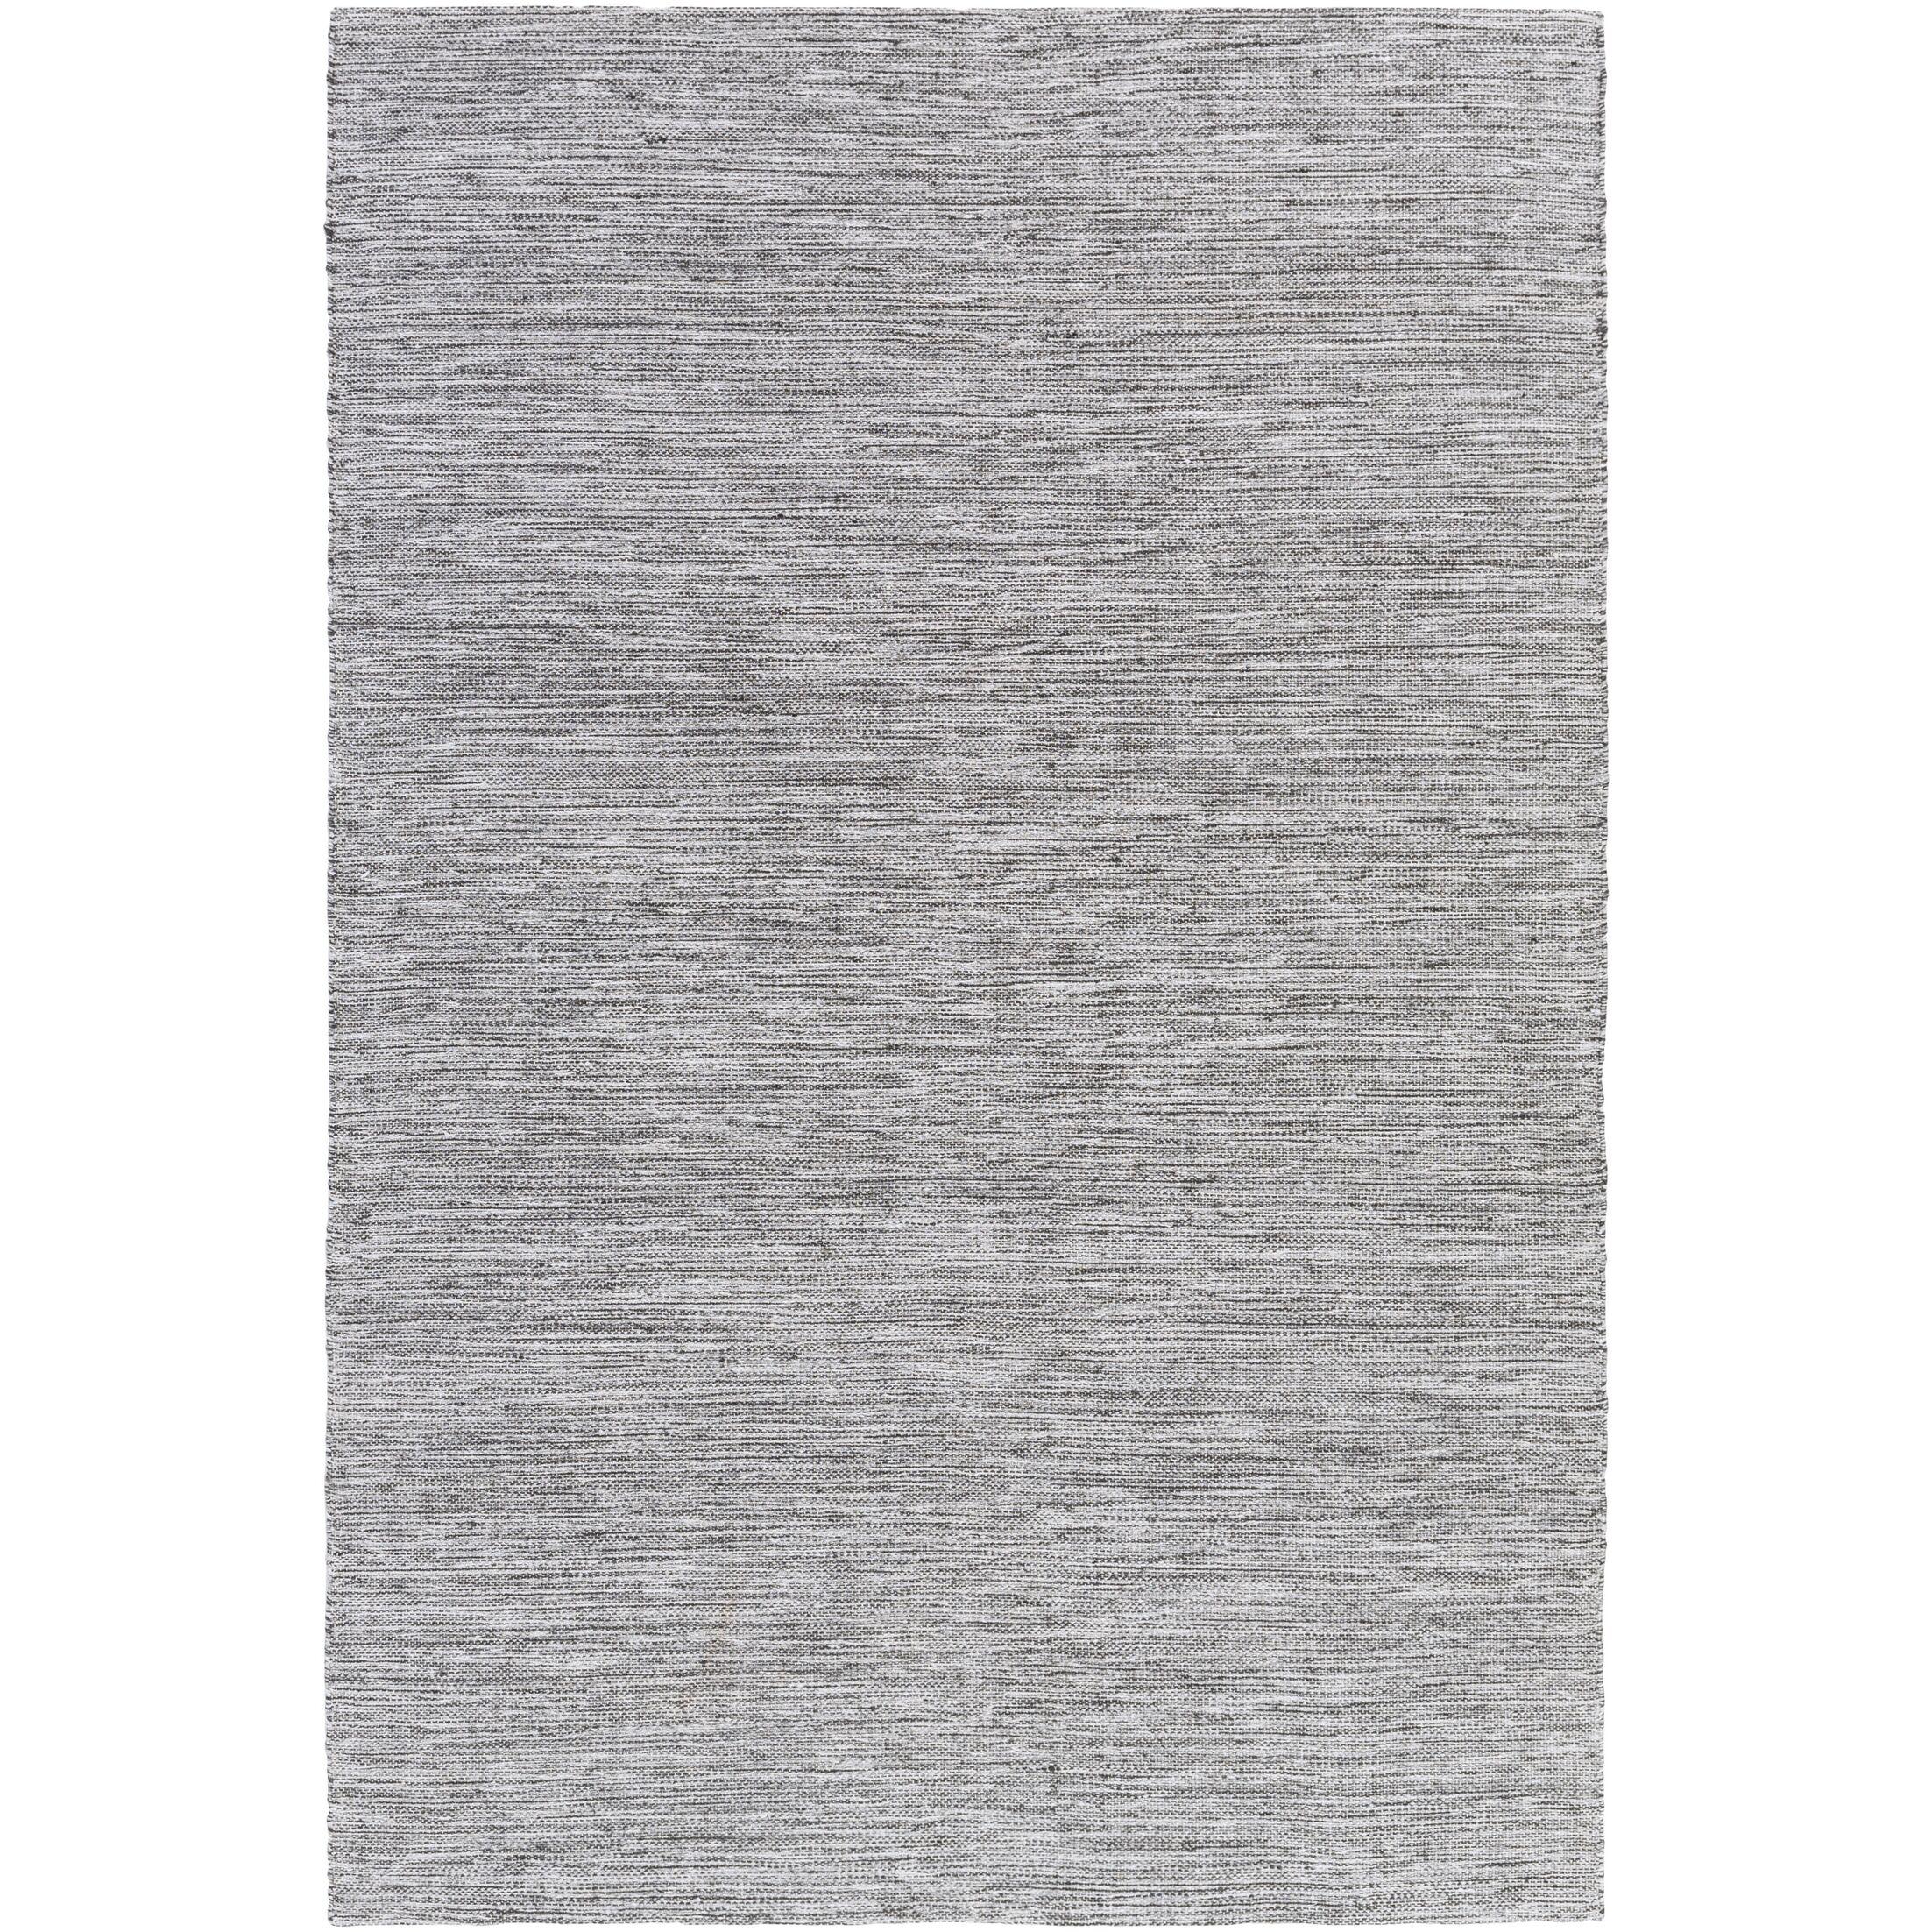 Hugo Hand-Woven Black/White Area Rug Rug Size: Rectangle 4' x 6'